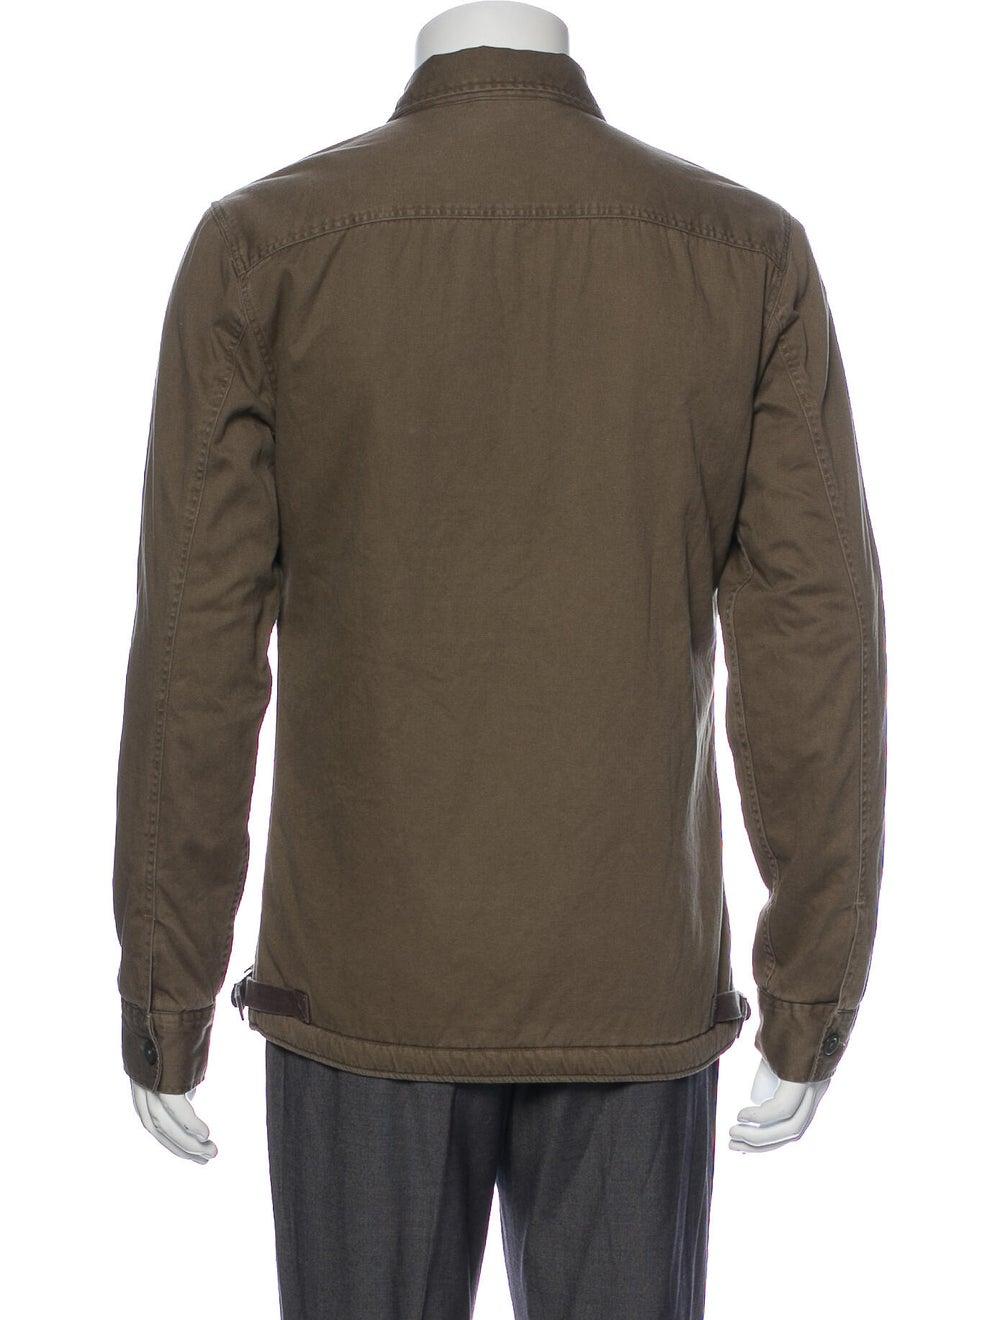 AllSaints Jacket w/ Tags Green - image 3